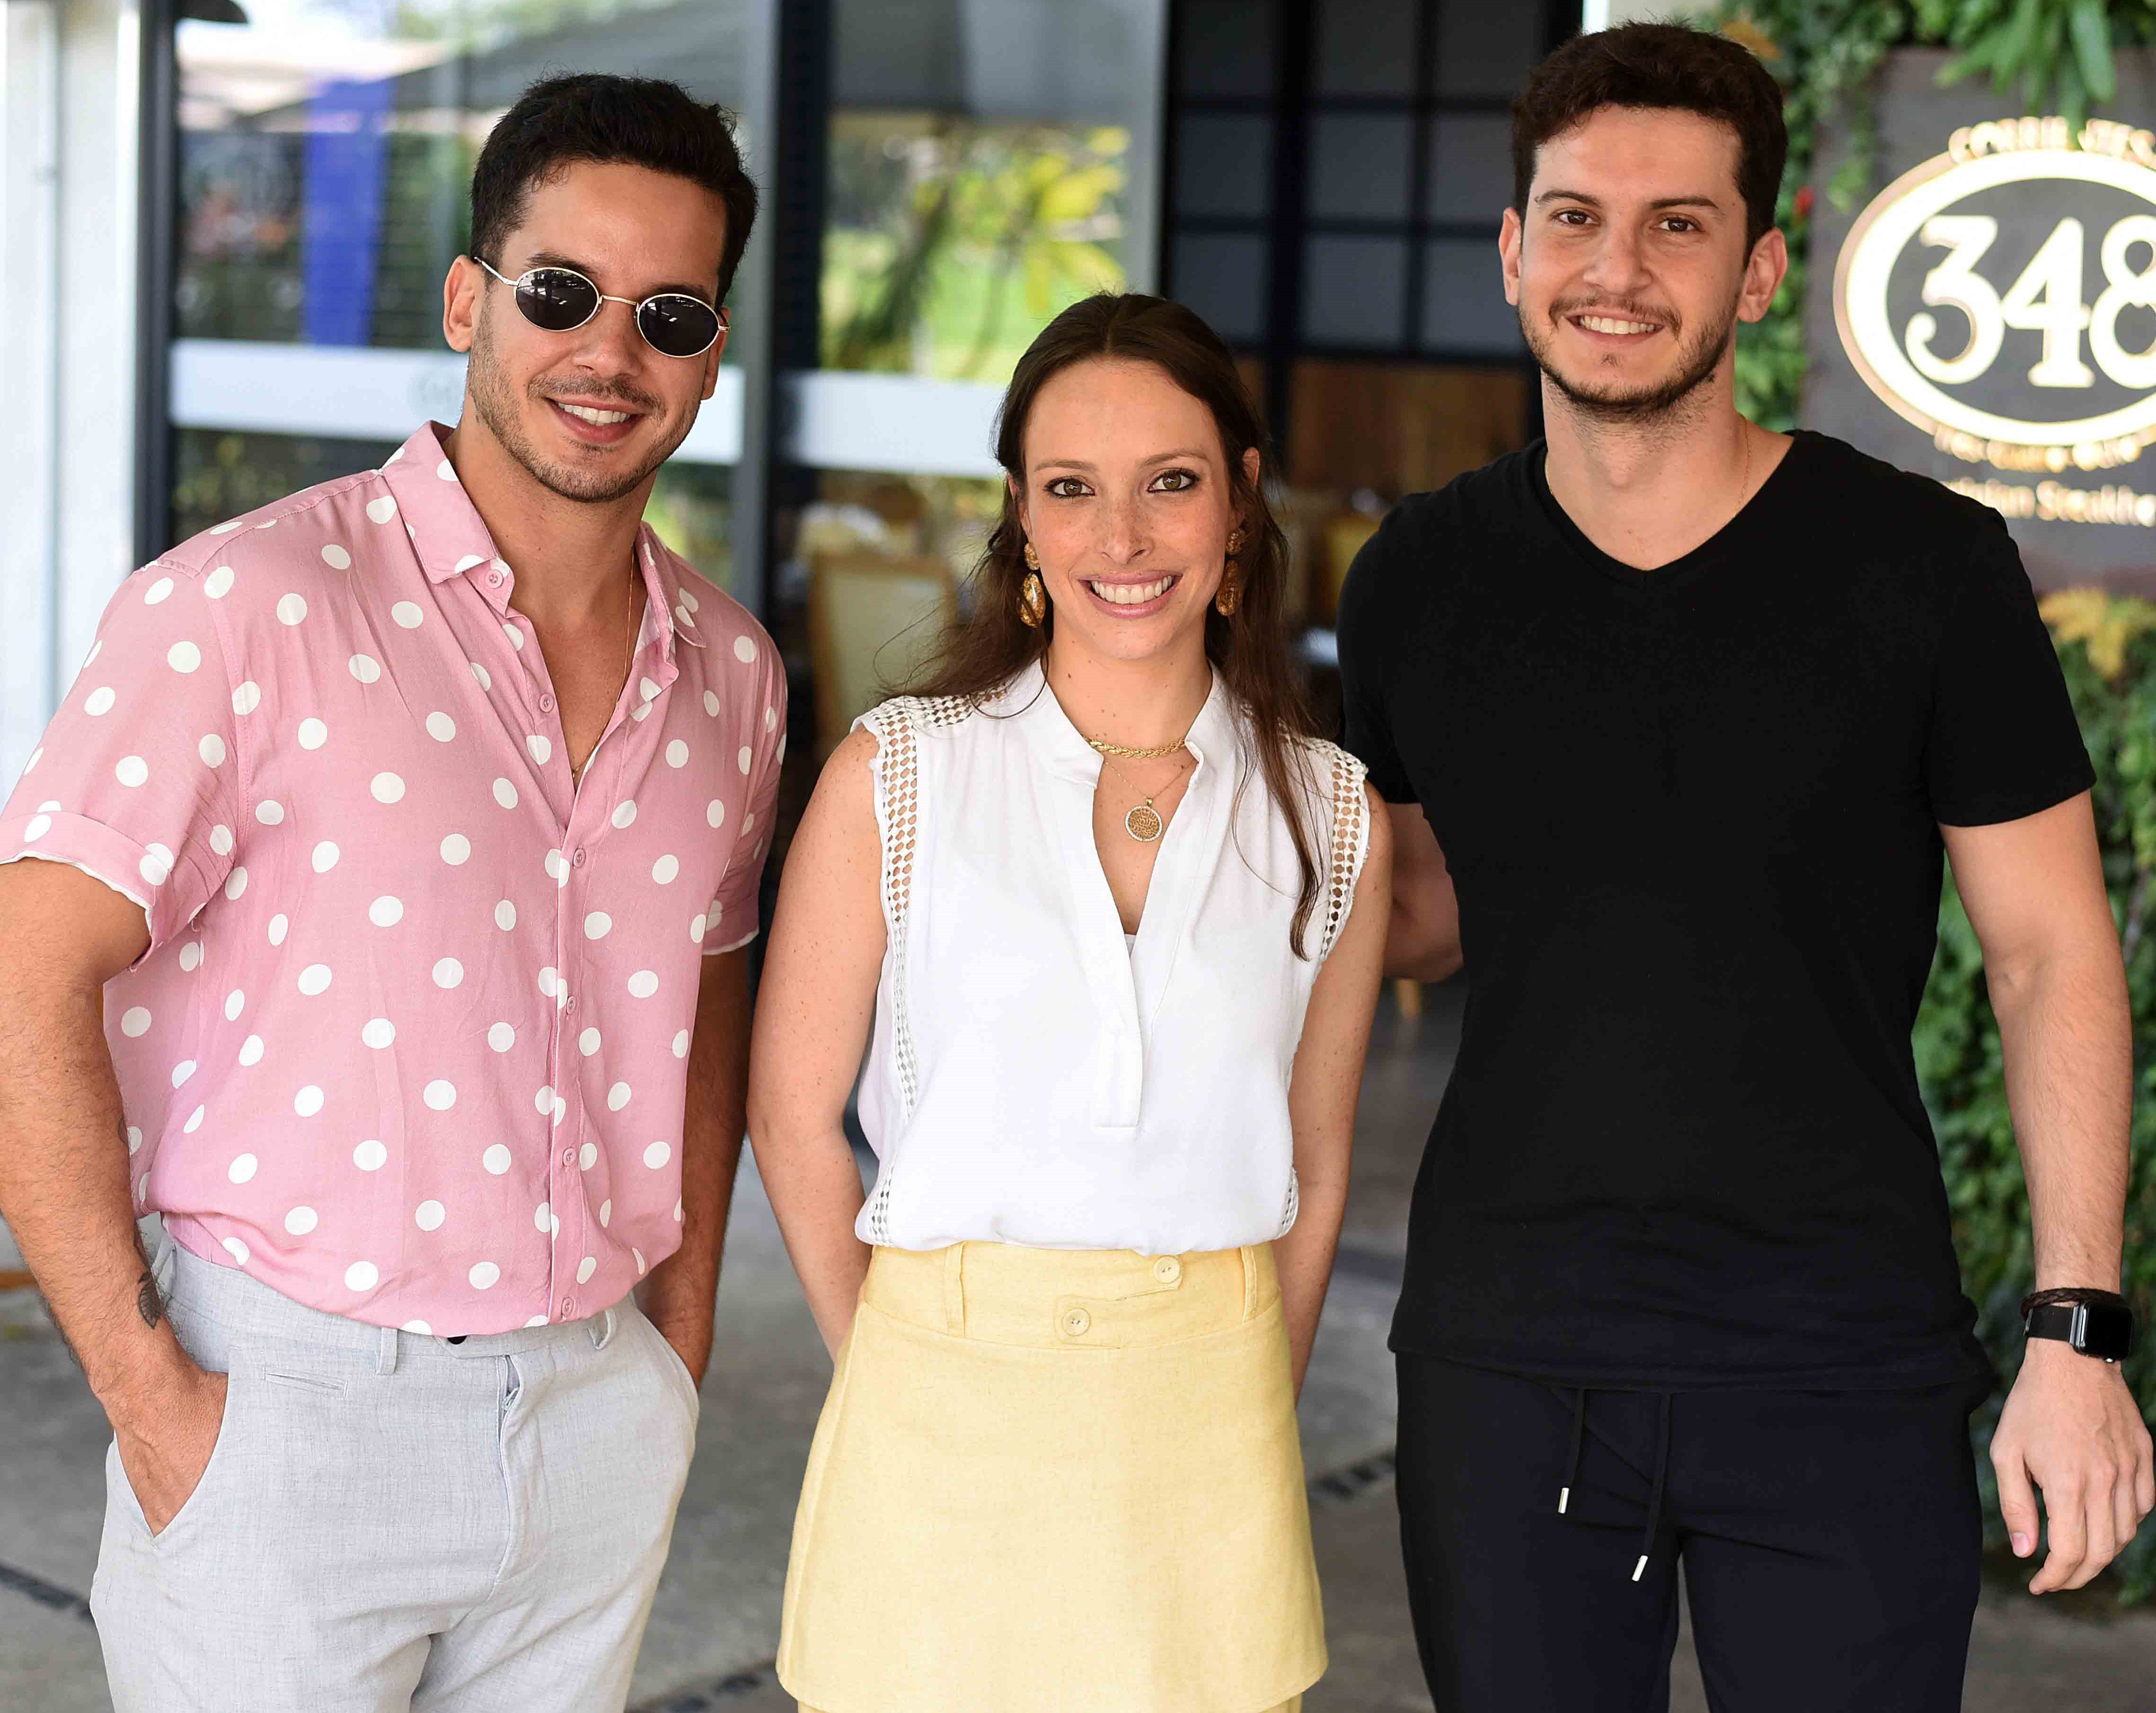 Carlos Carvalho, Giselle Rivkind e Caio Carvalho /Foto: Ari Kaye